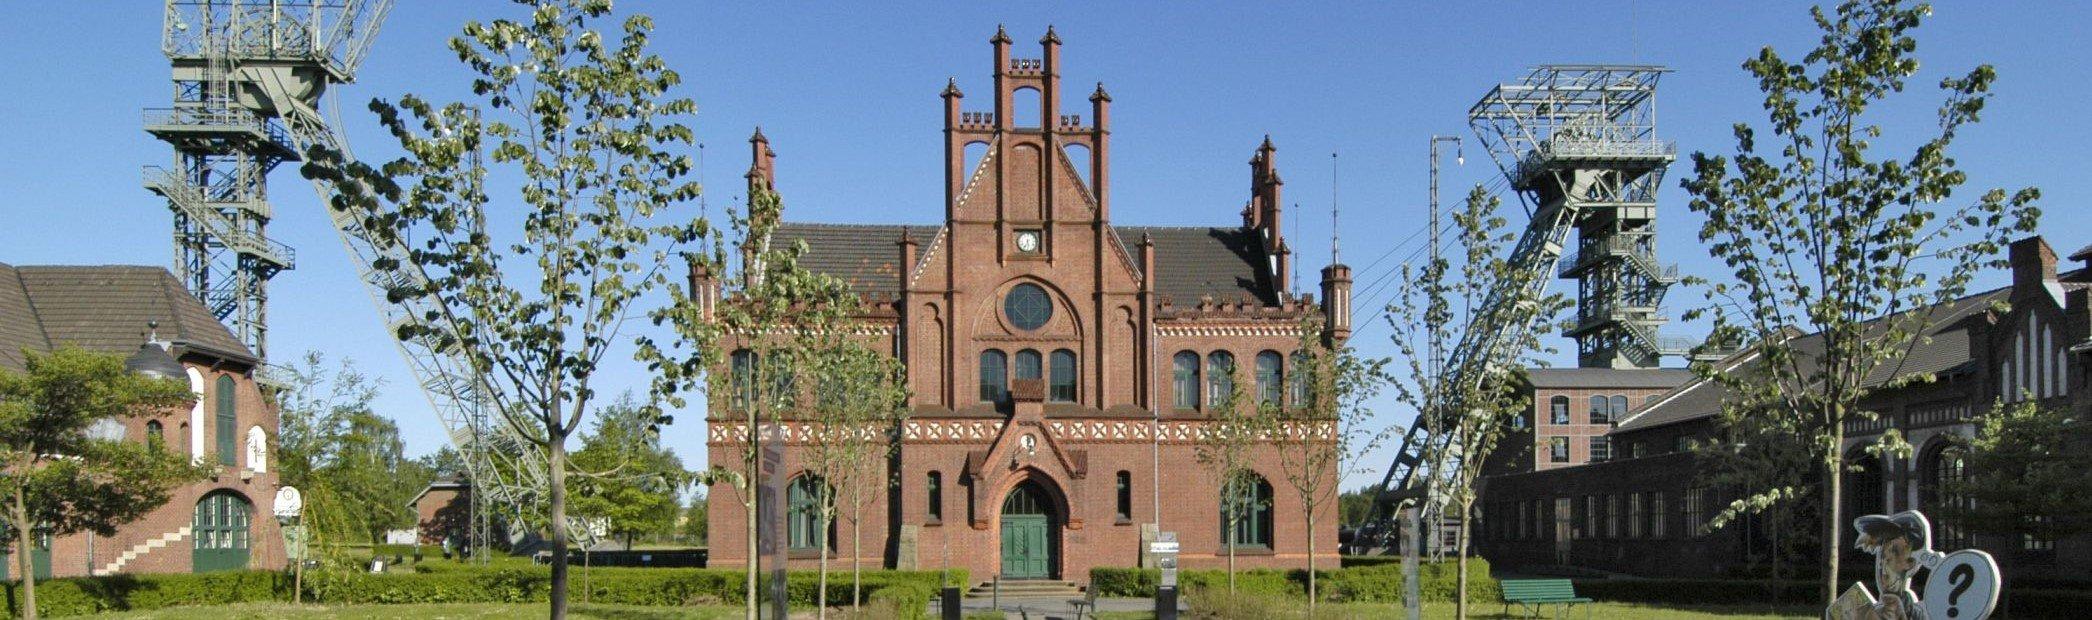 (LWL-Industriemuseum Zeche Zollern in Dortmund Foto: LWL